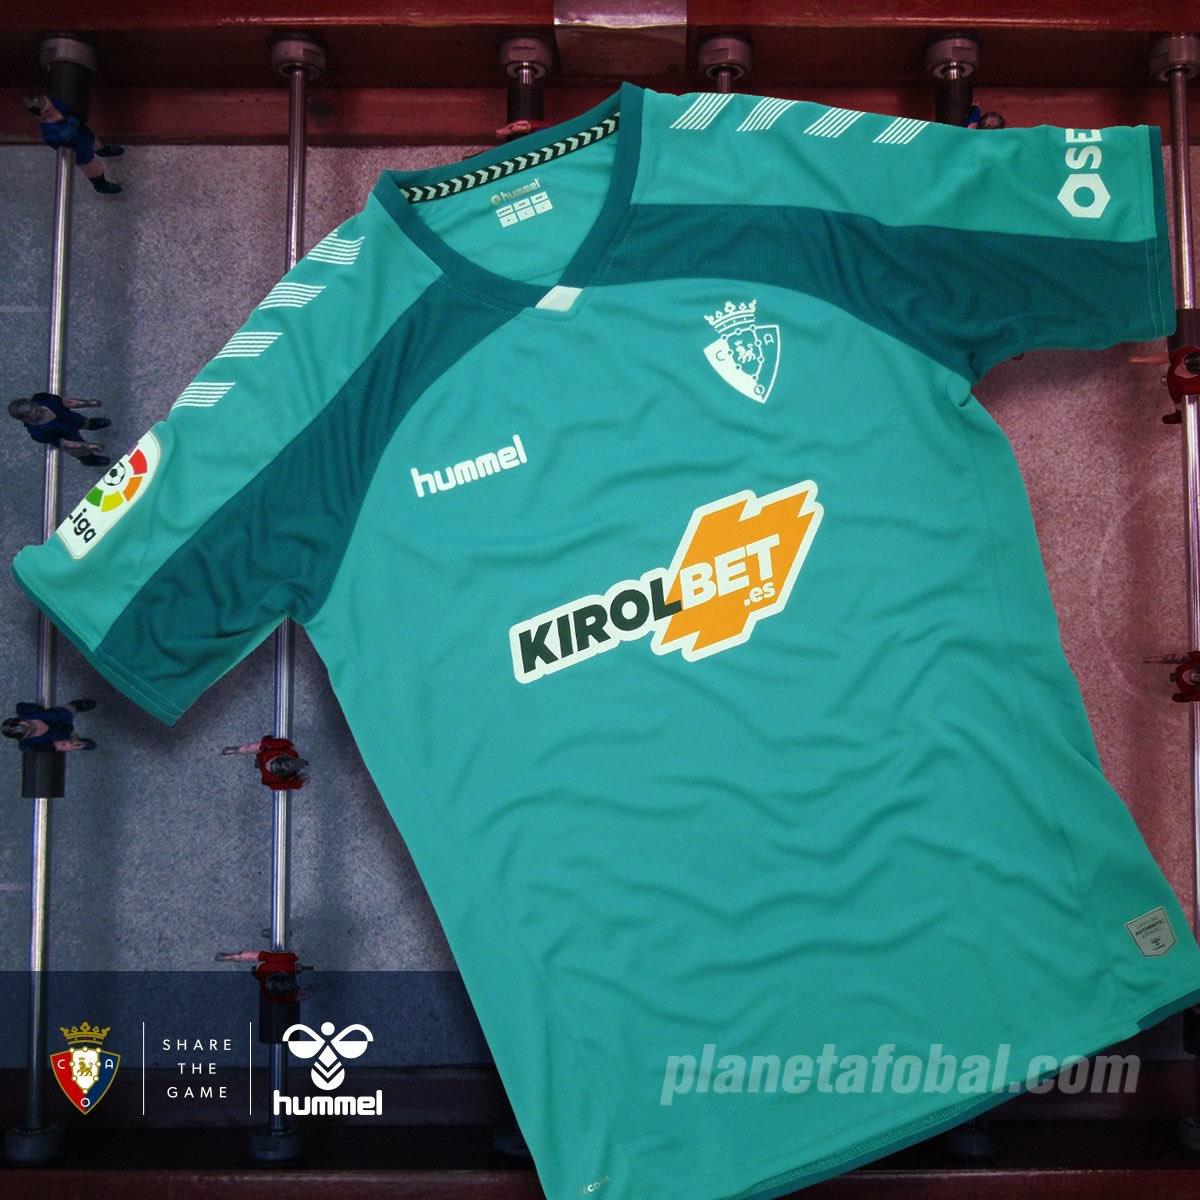 Segunda equipación Hummel del Osasuna 2019/20 | Imagen Twitter Oficial